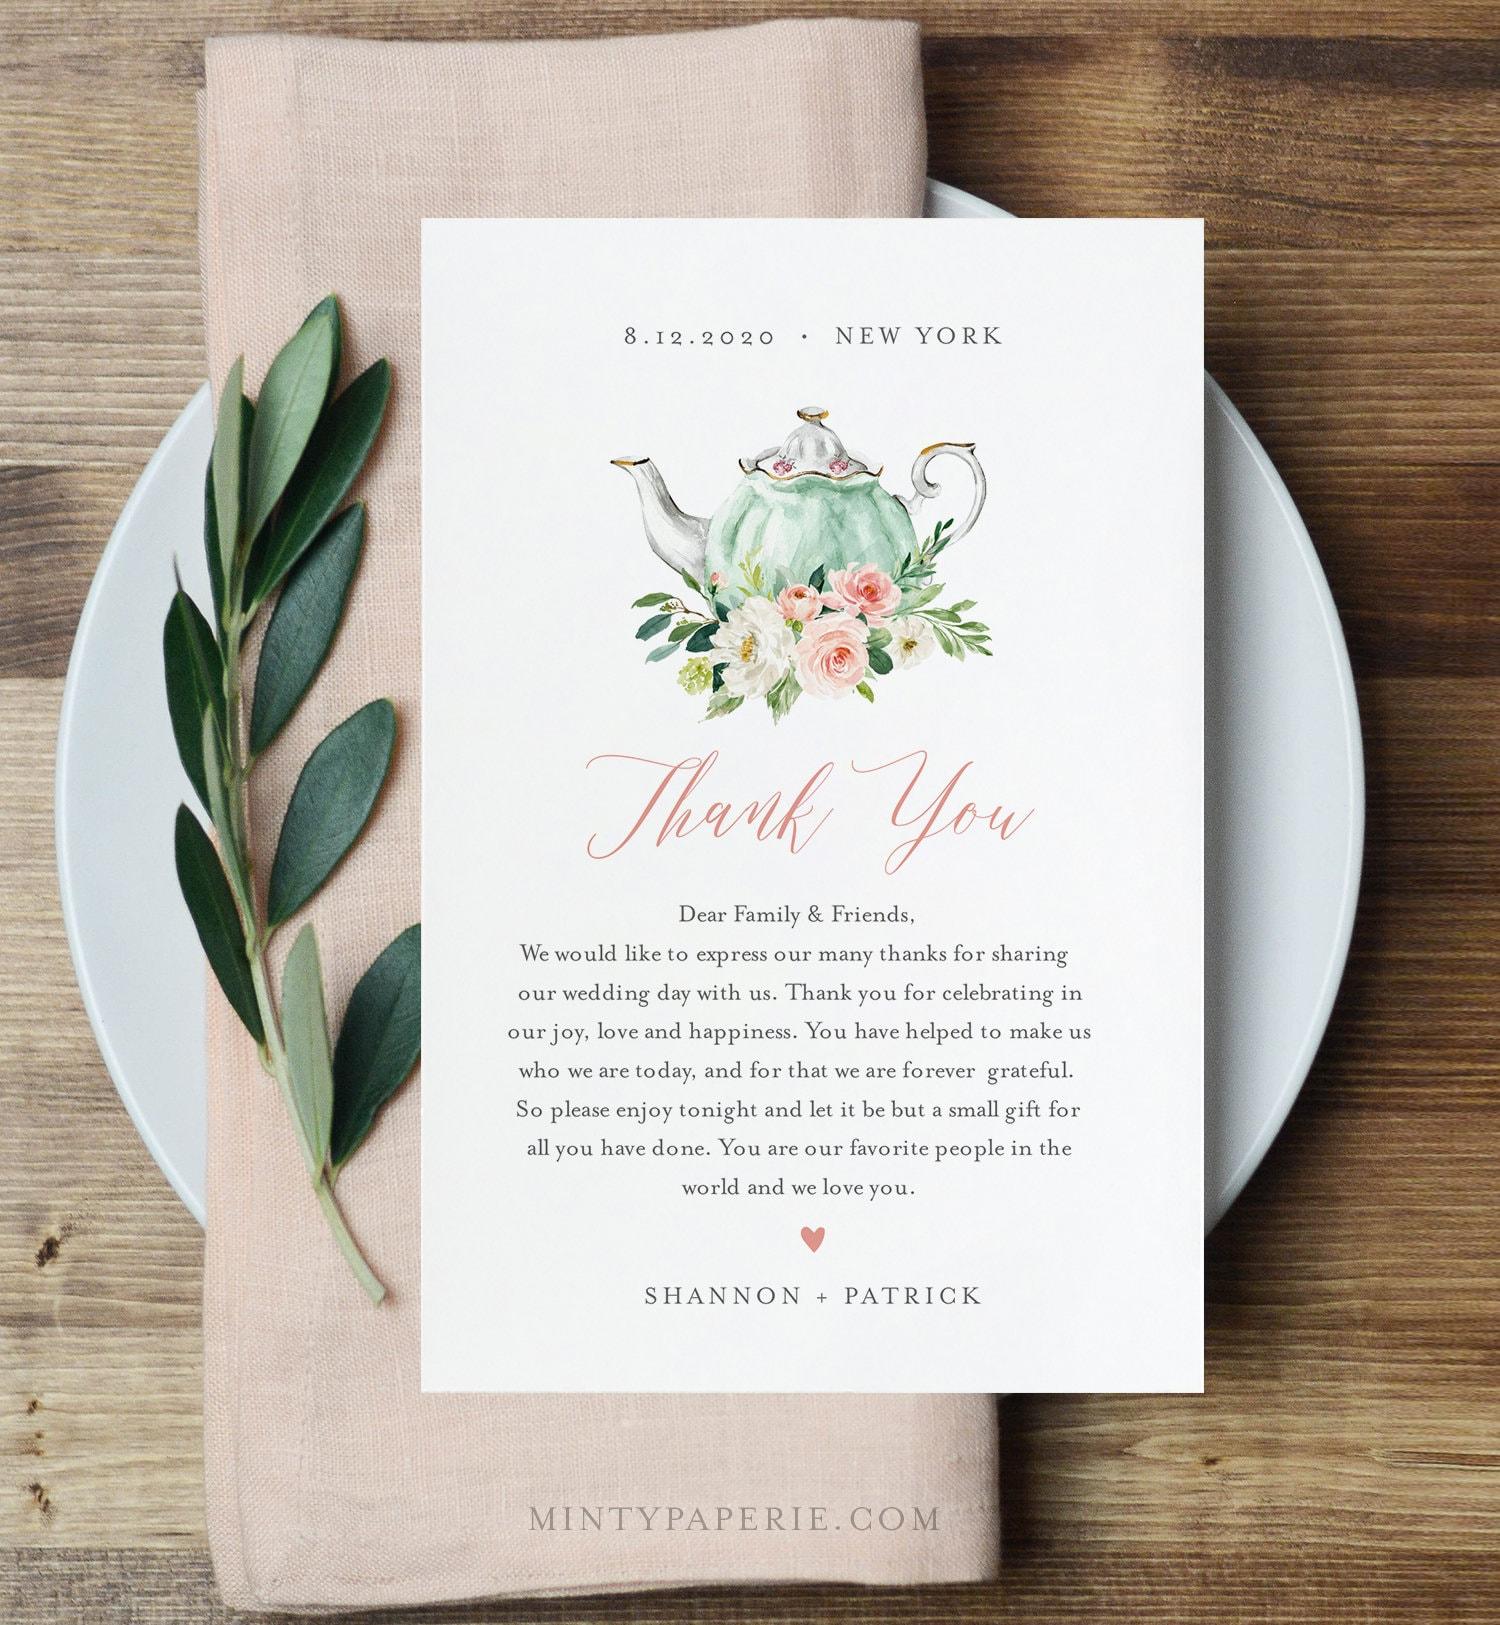 Tea Party Thank You Letter, Napkin Note, Printable Wedding Menu Thank You, Editable Template